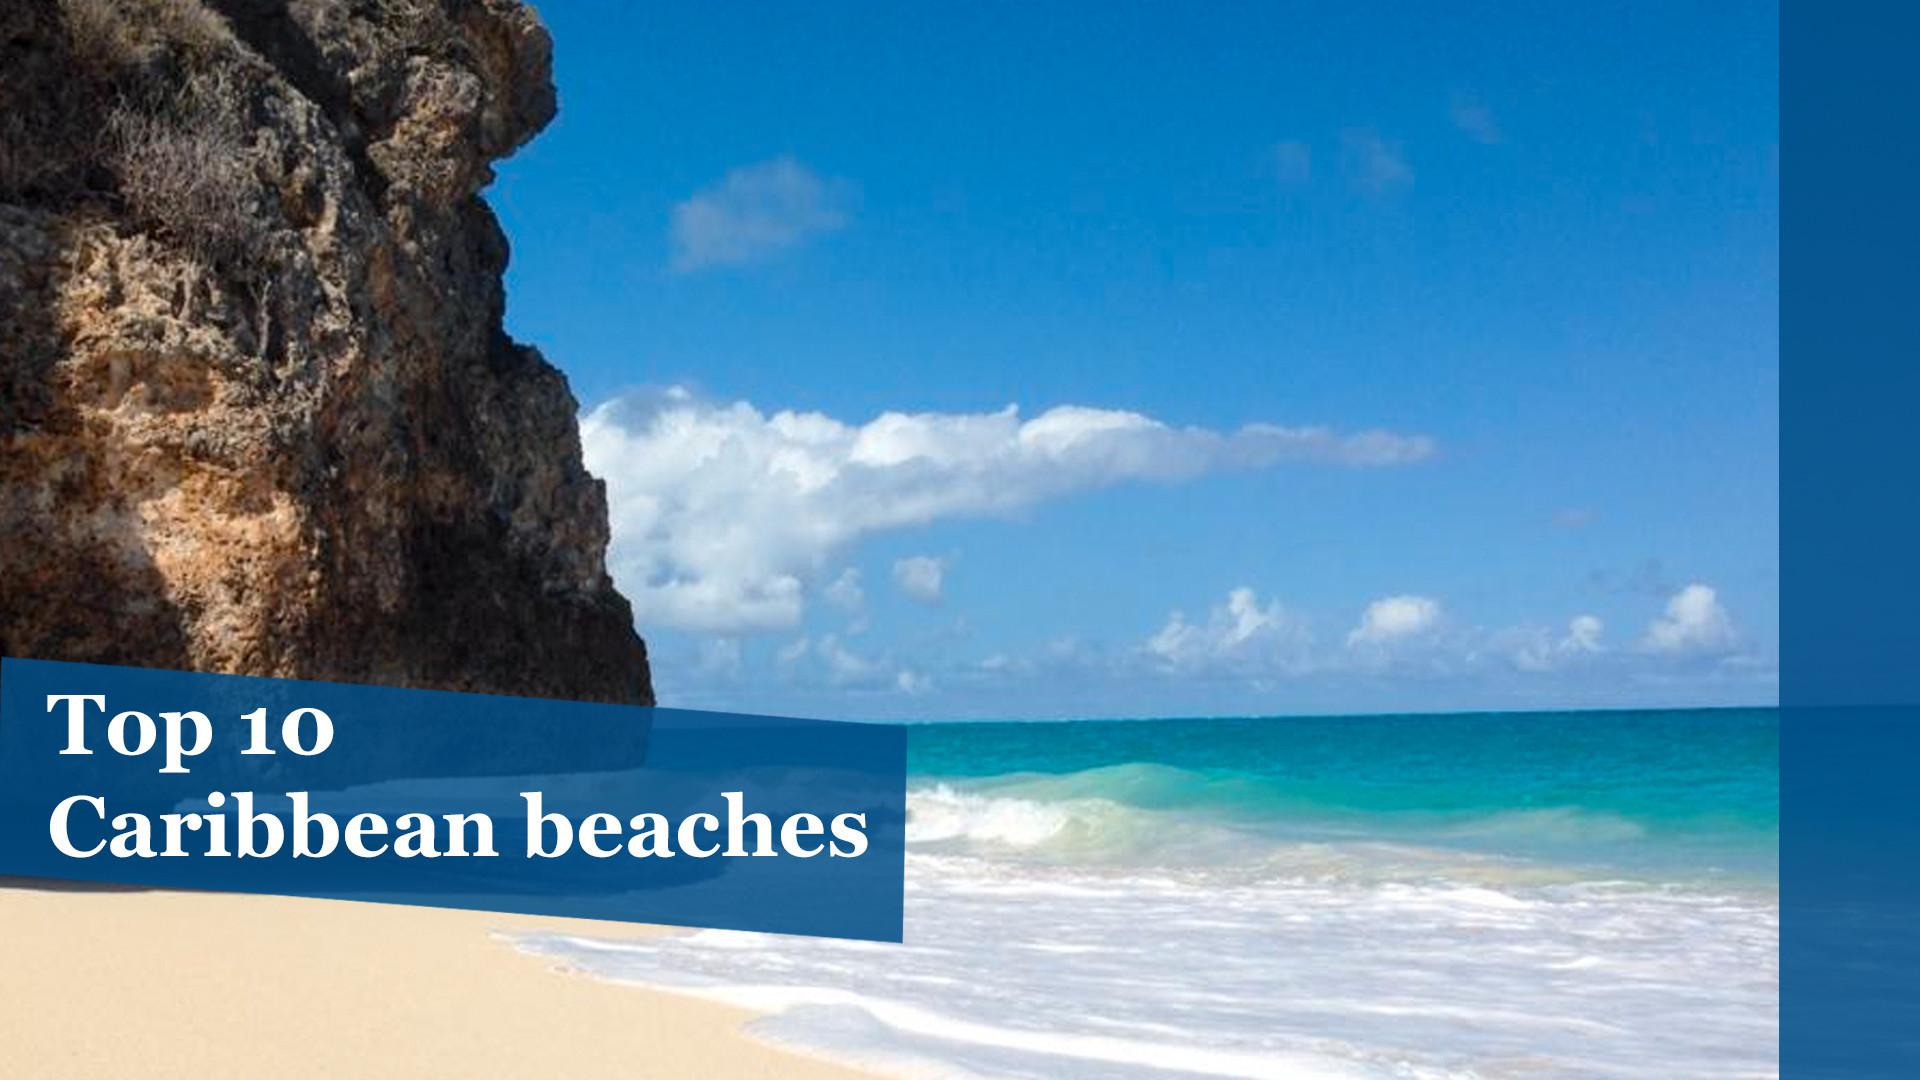 Top 10 Caribbean beaches  Chicago Tribune